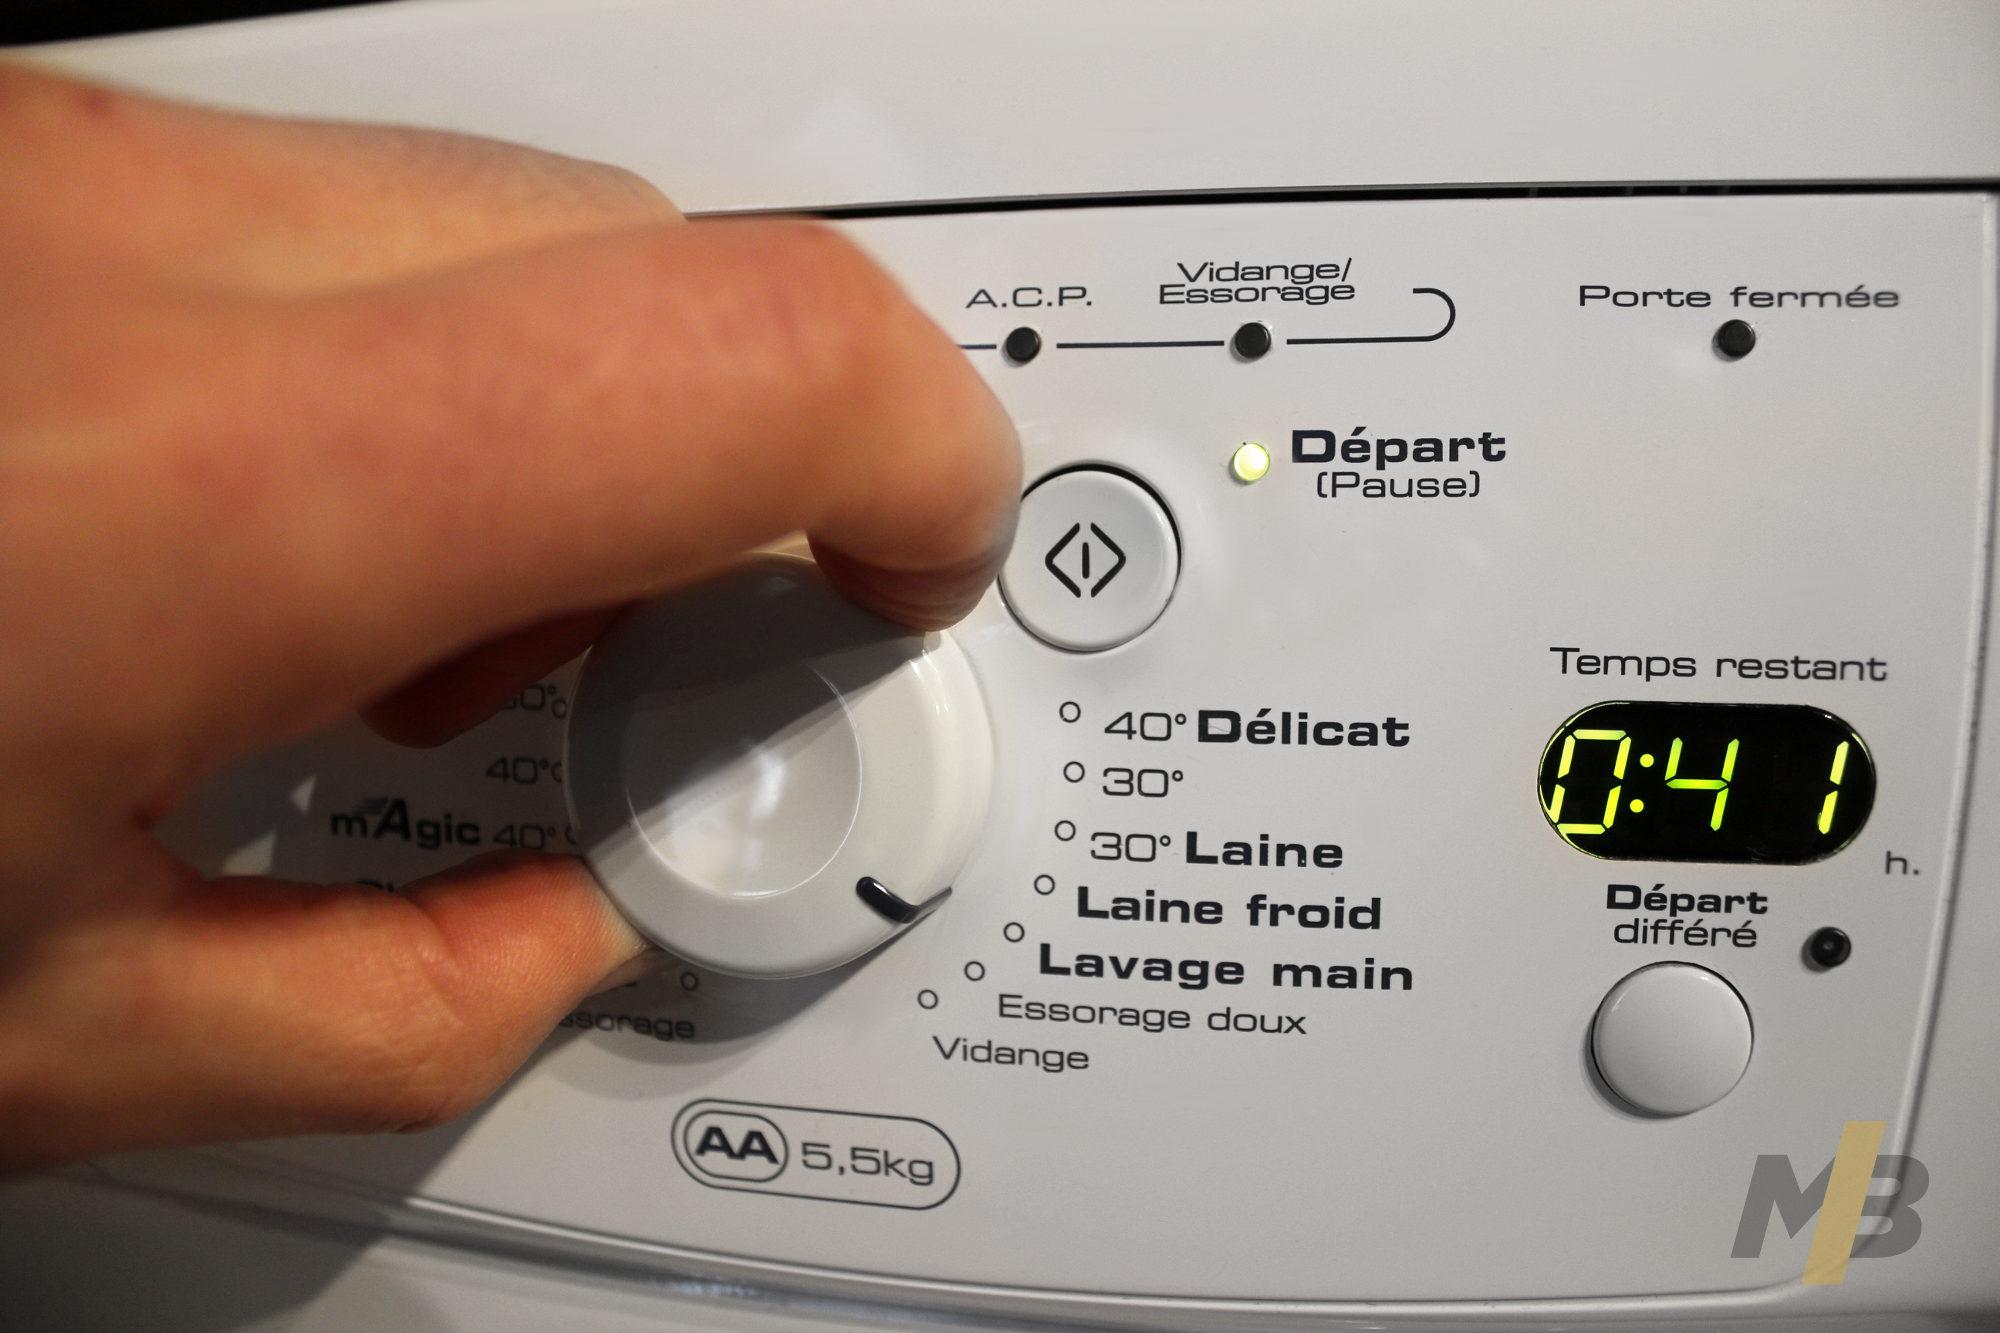 Machine programme lavage main